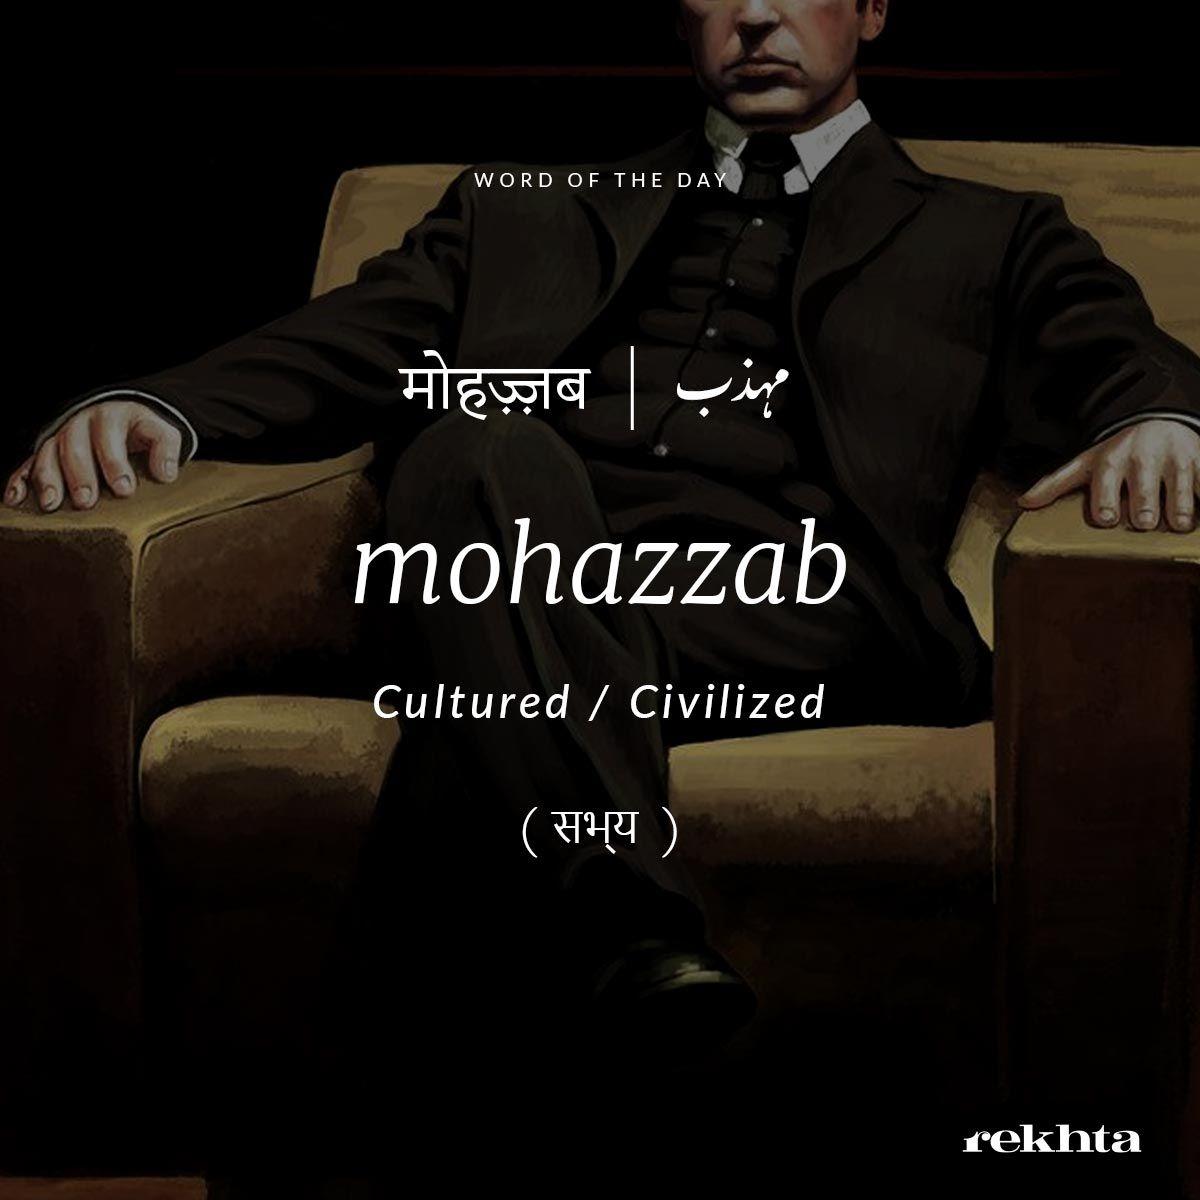 Urdu words #Words #Urdu #Learn Urdu #Urdu world #Mohazzab | Urdu